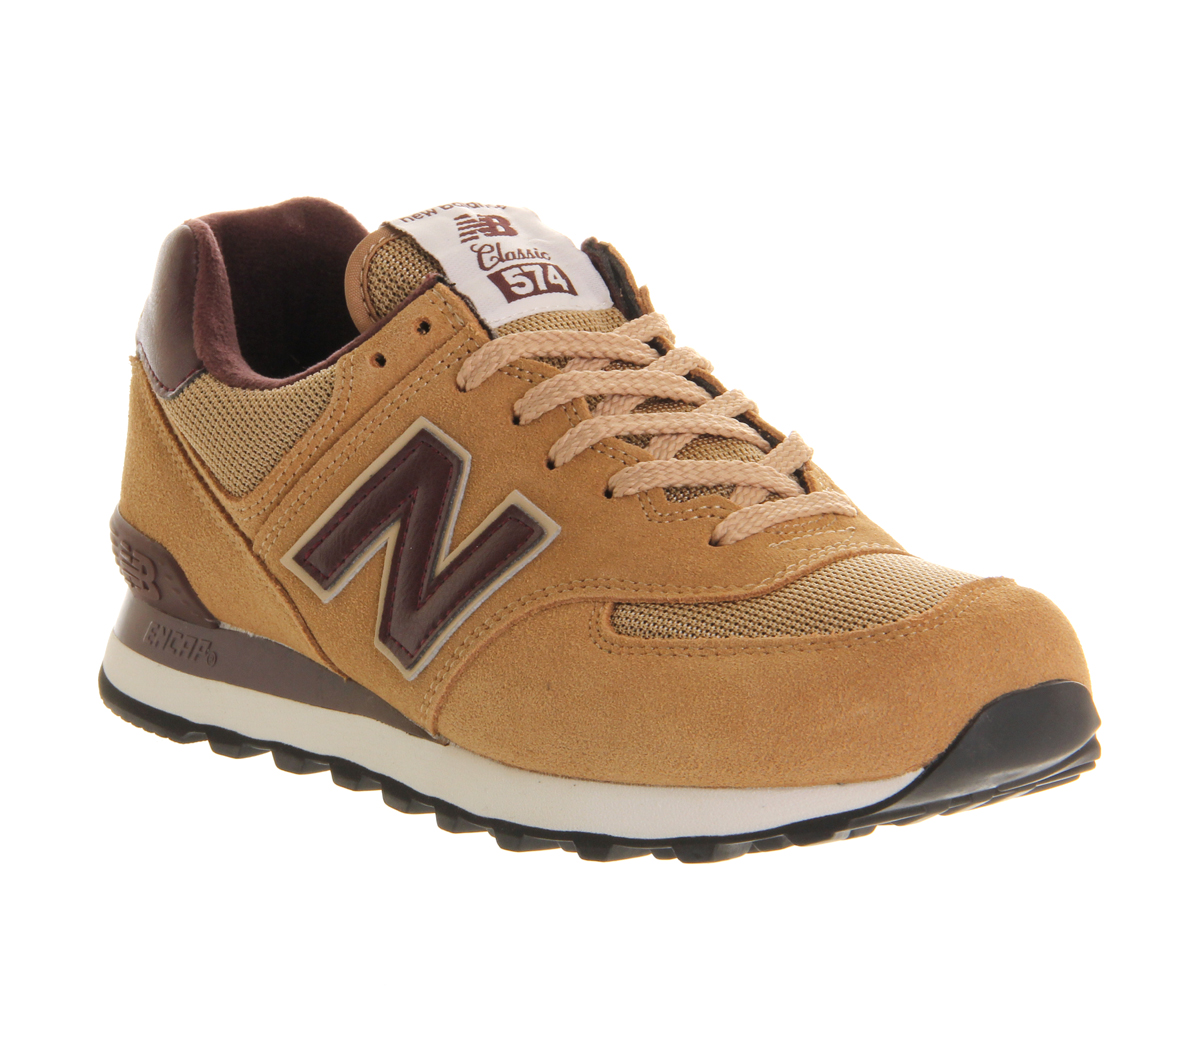 new balance 574 mens brown